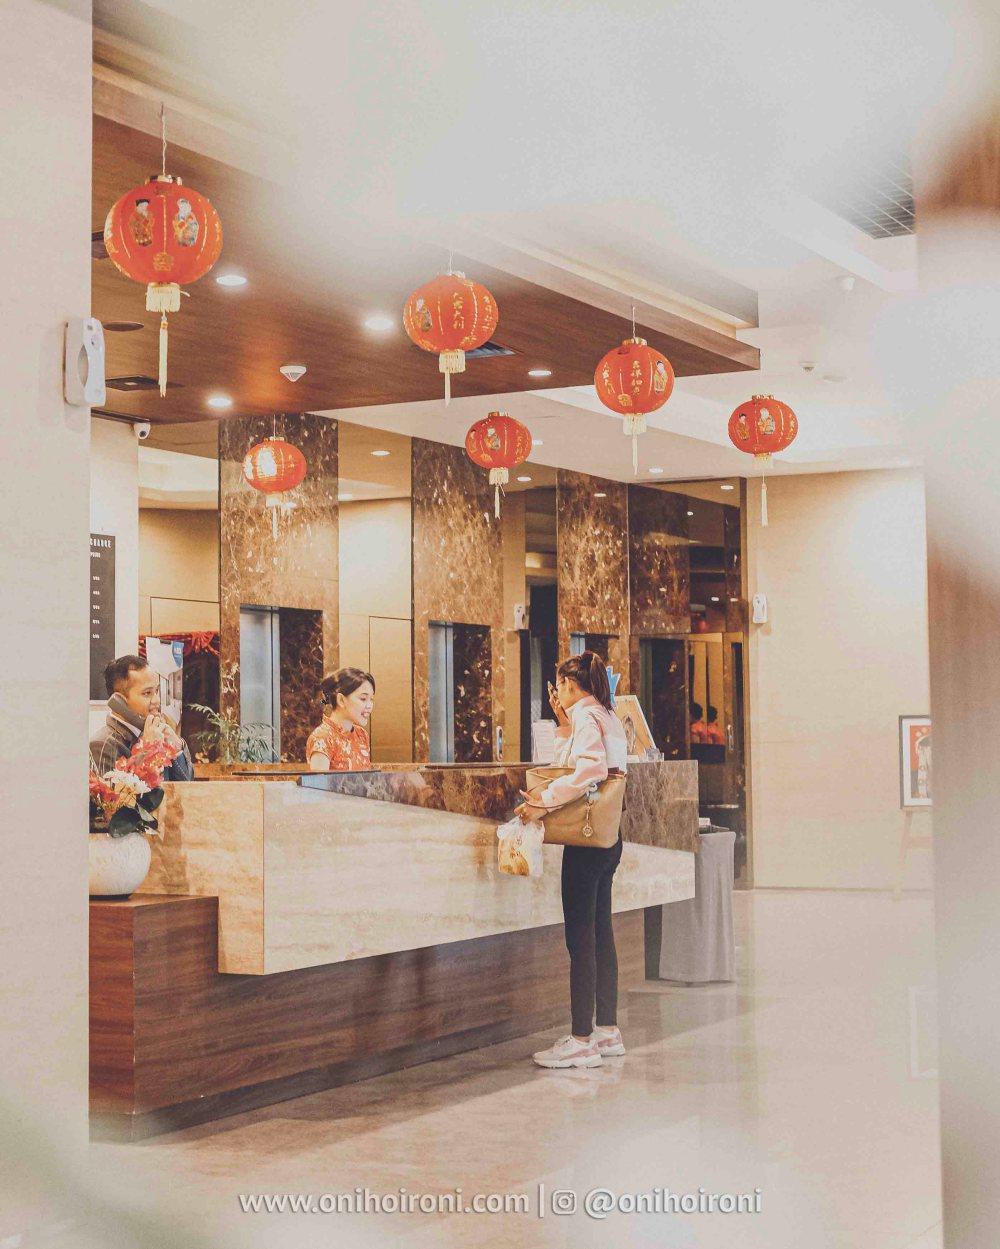 4 Lobby Review Hotel Grand Whiz Poins Simatupang Jakarta oni hoironi